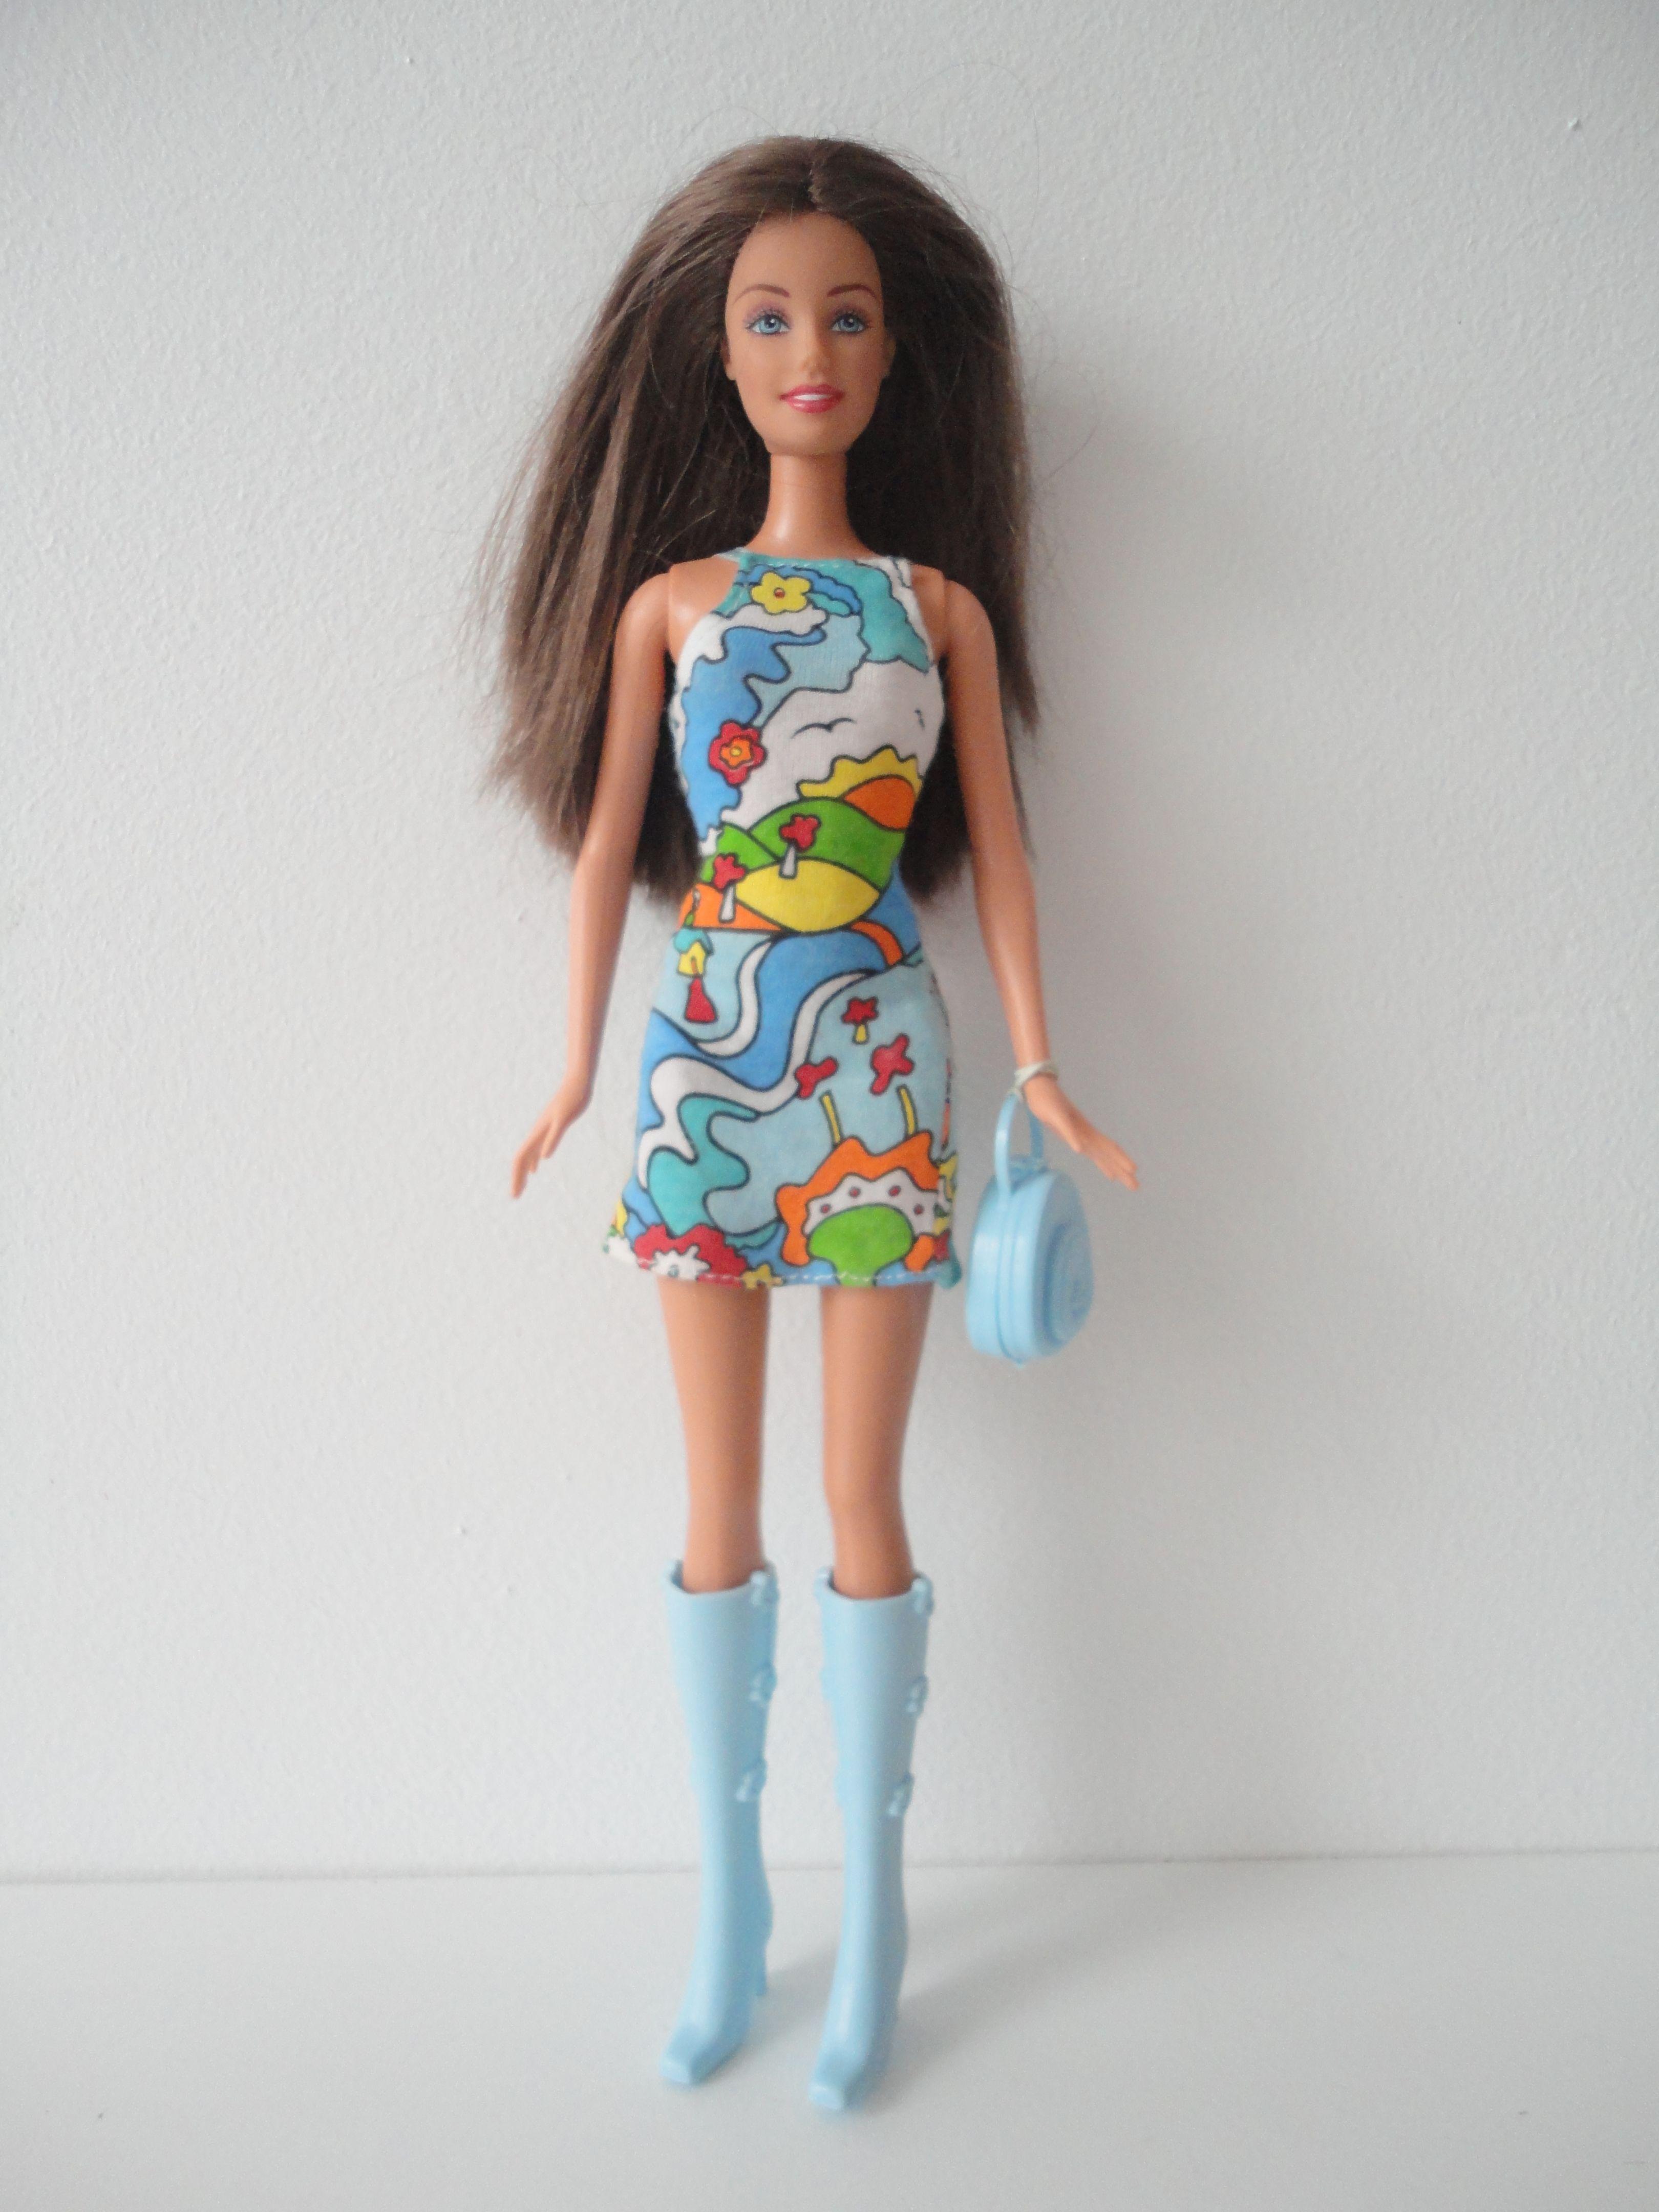 Barbie Sunshine Day Teresa BD2001 #52838 | Barbie, Barbie